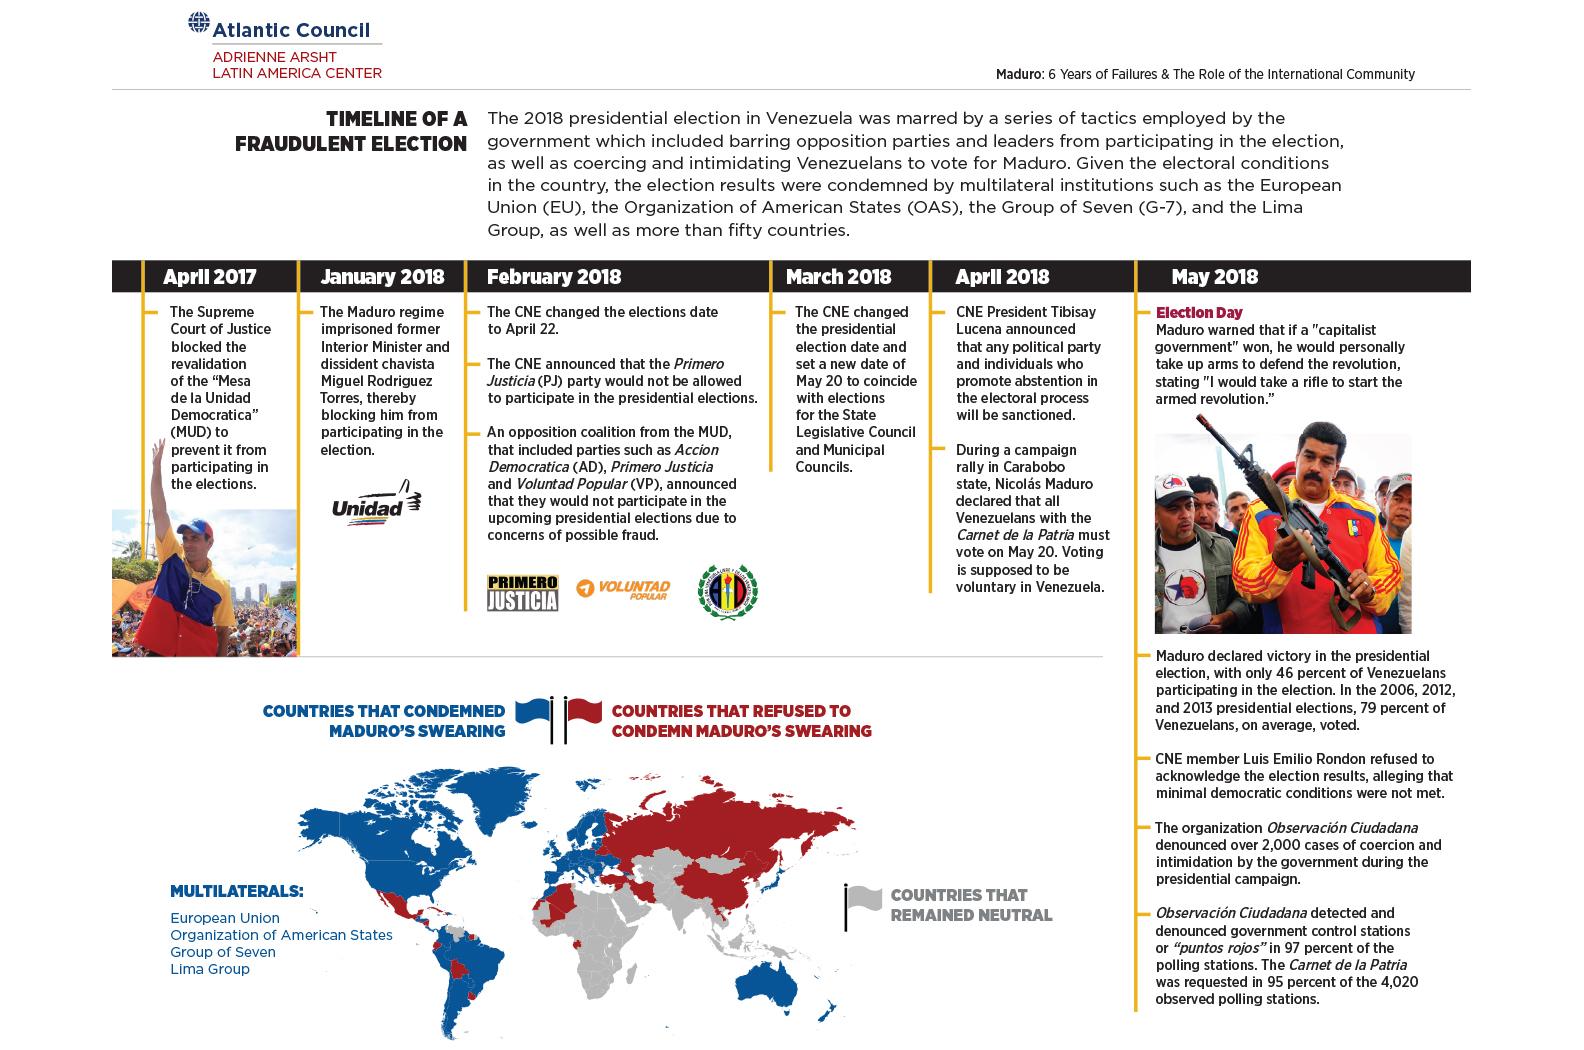 MADURO: Fraud and six years of failures